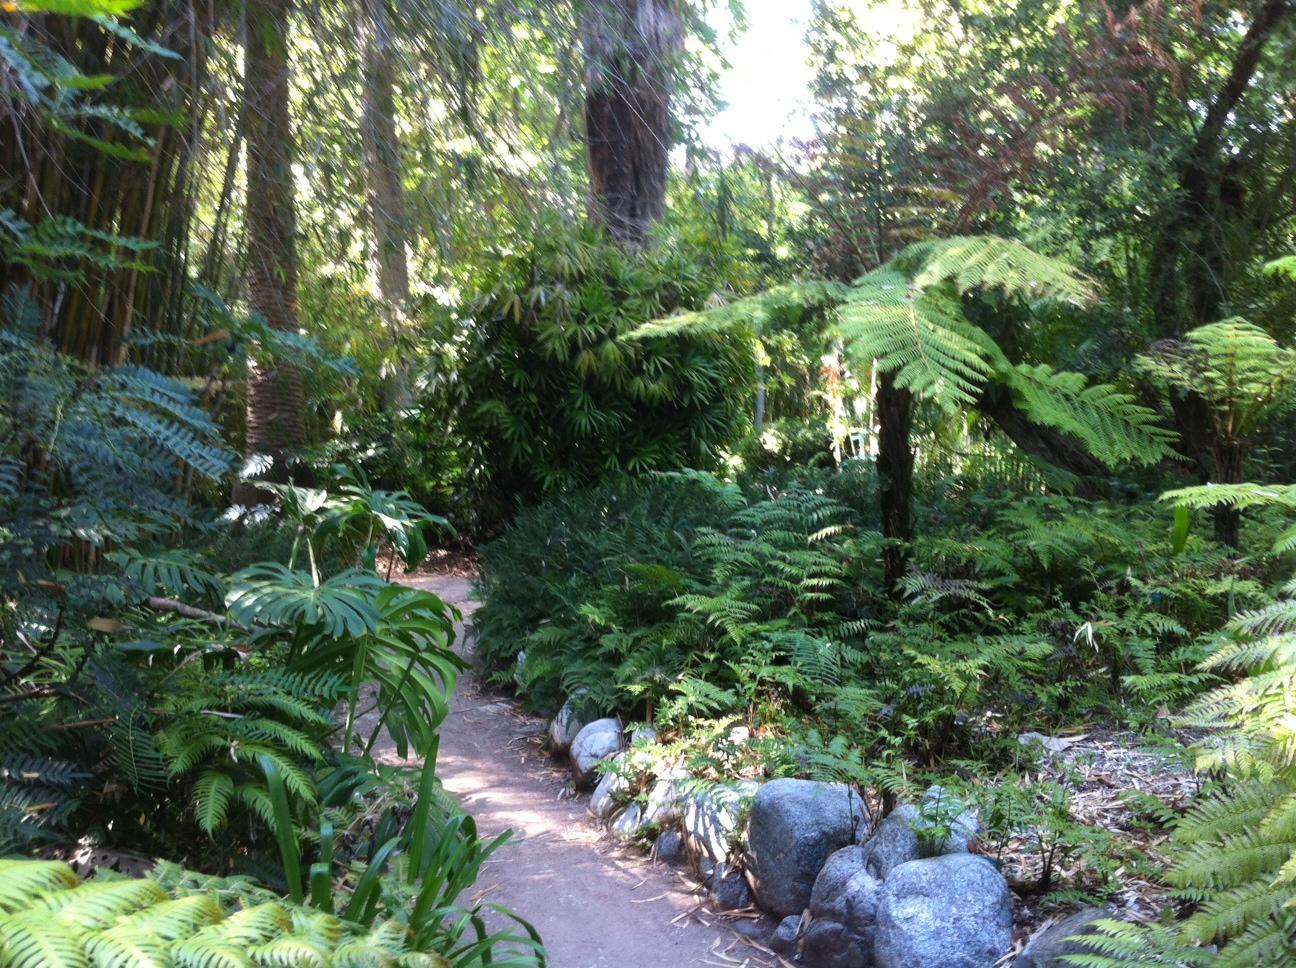 File:Mildred E. Matthias Botanical Gardens 06.JPG